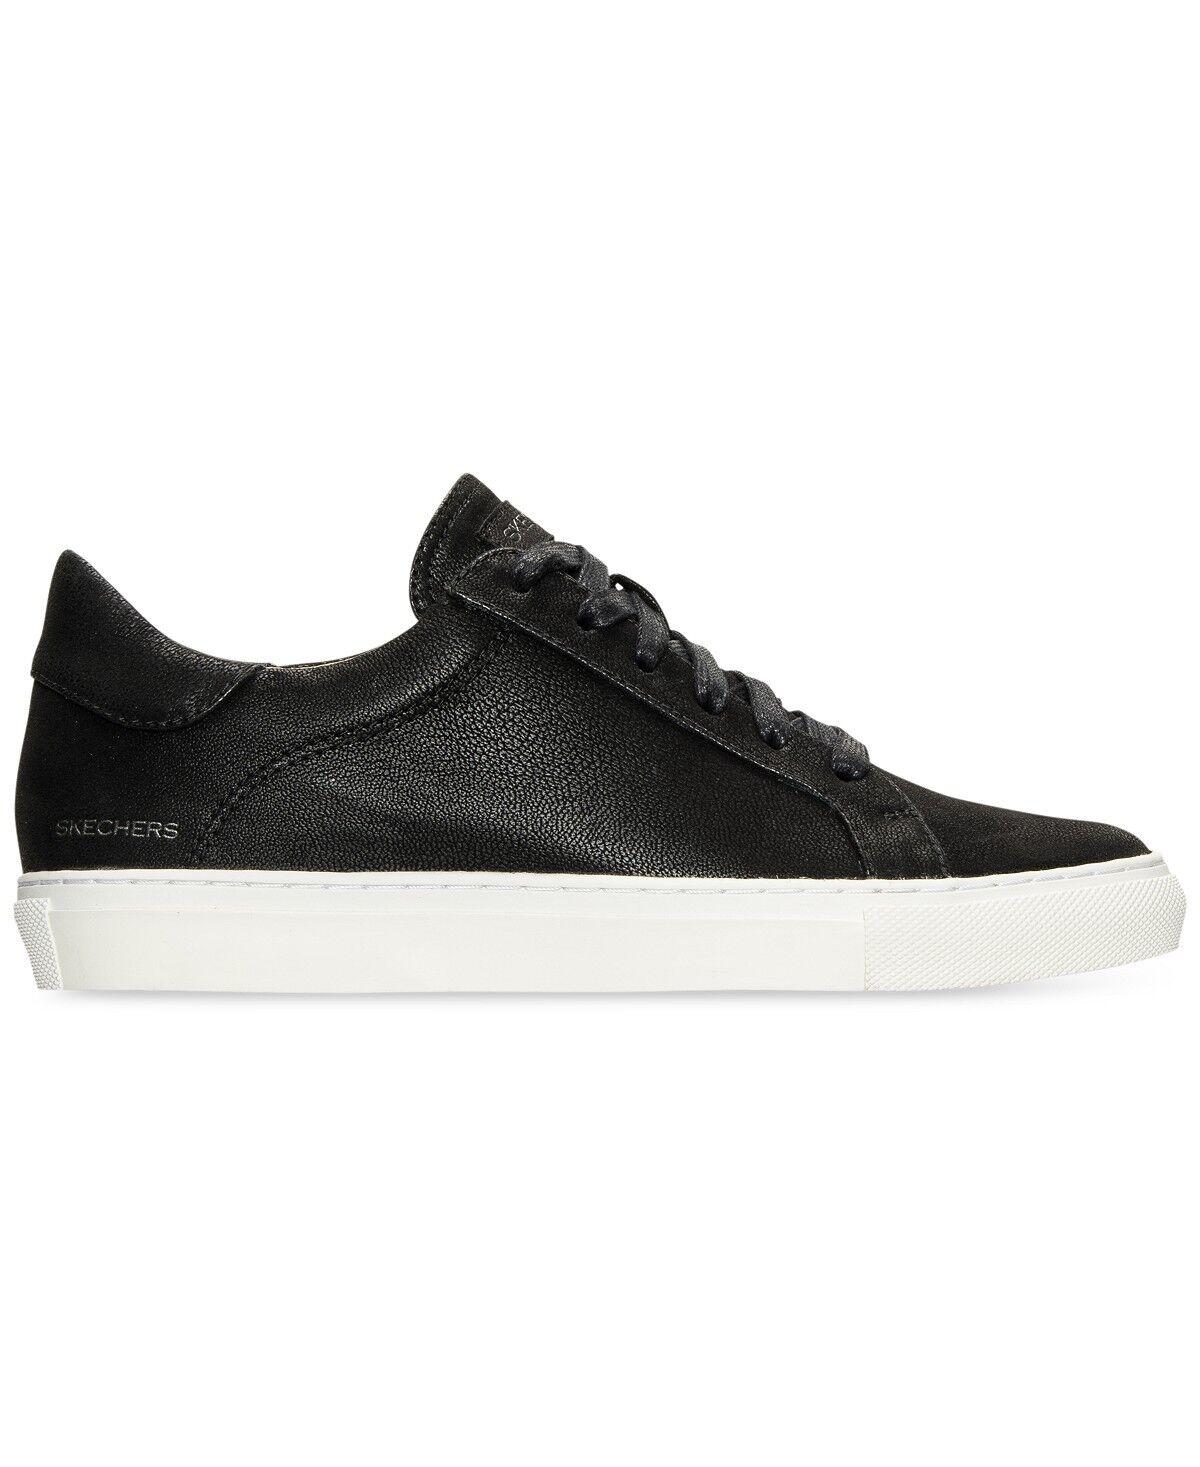 NEU Skechers WMN Vaso-Cordon Lace-Up Casual Leder Sneakers Schuhes sz 6M